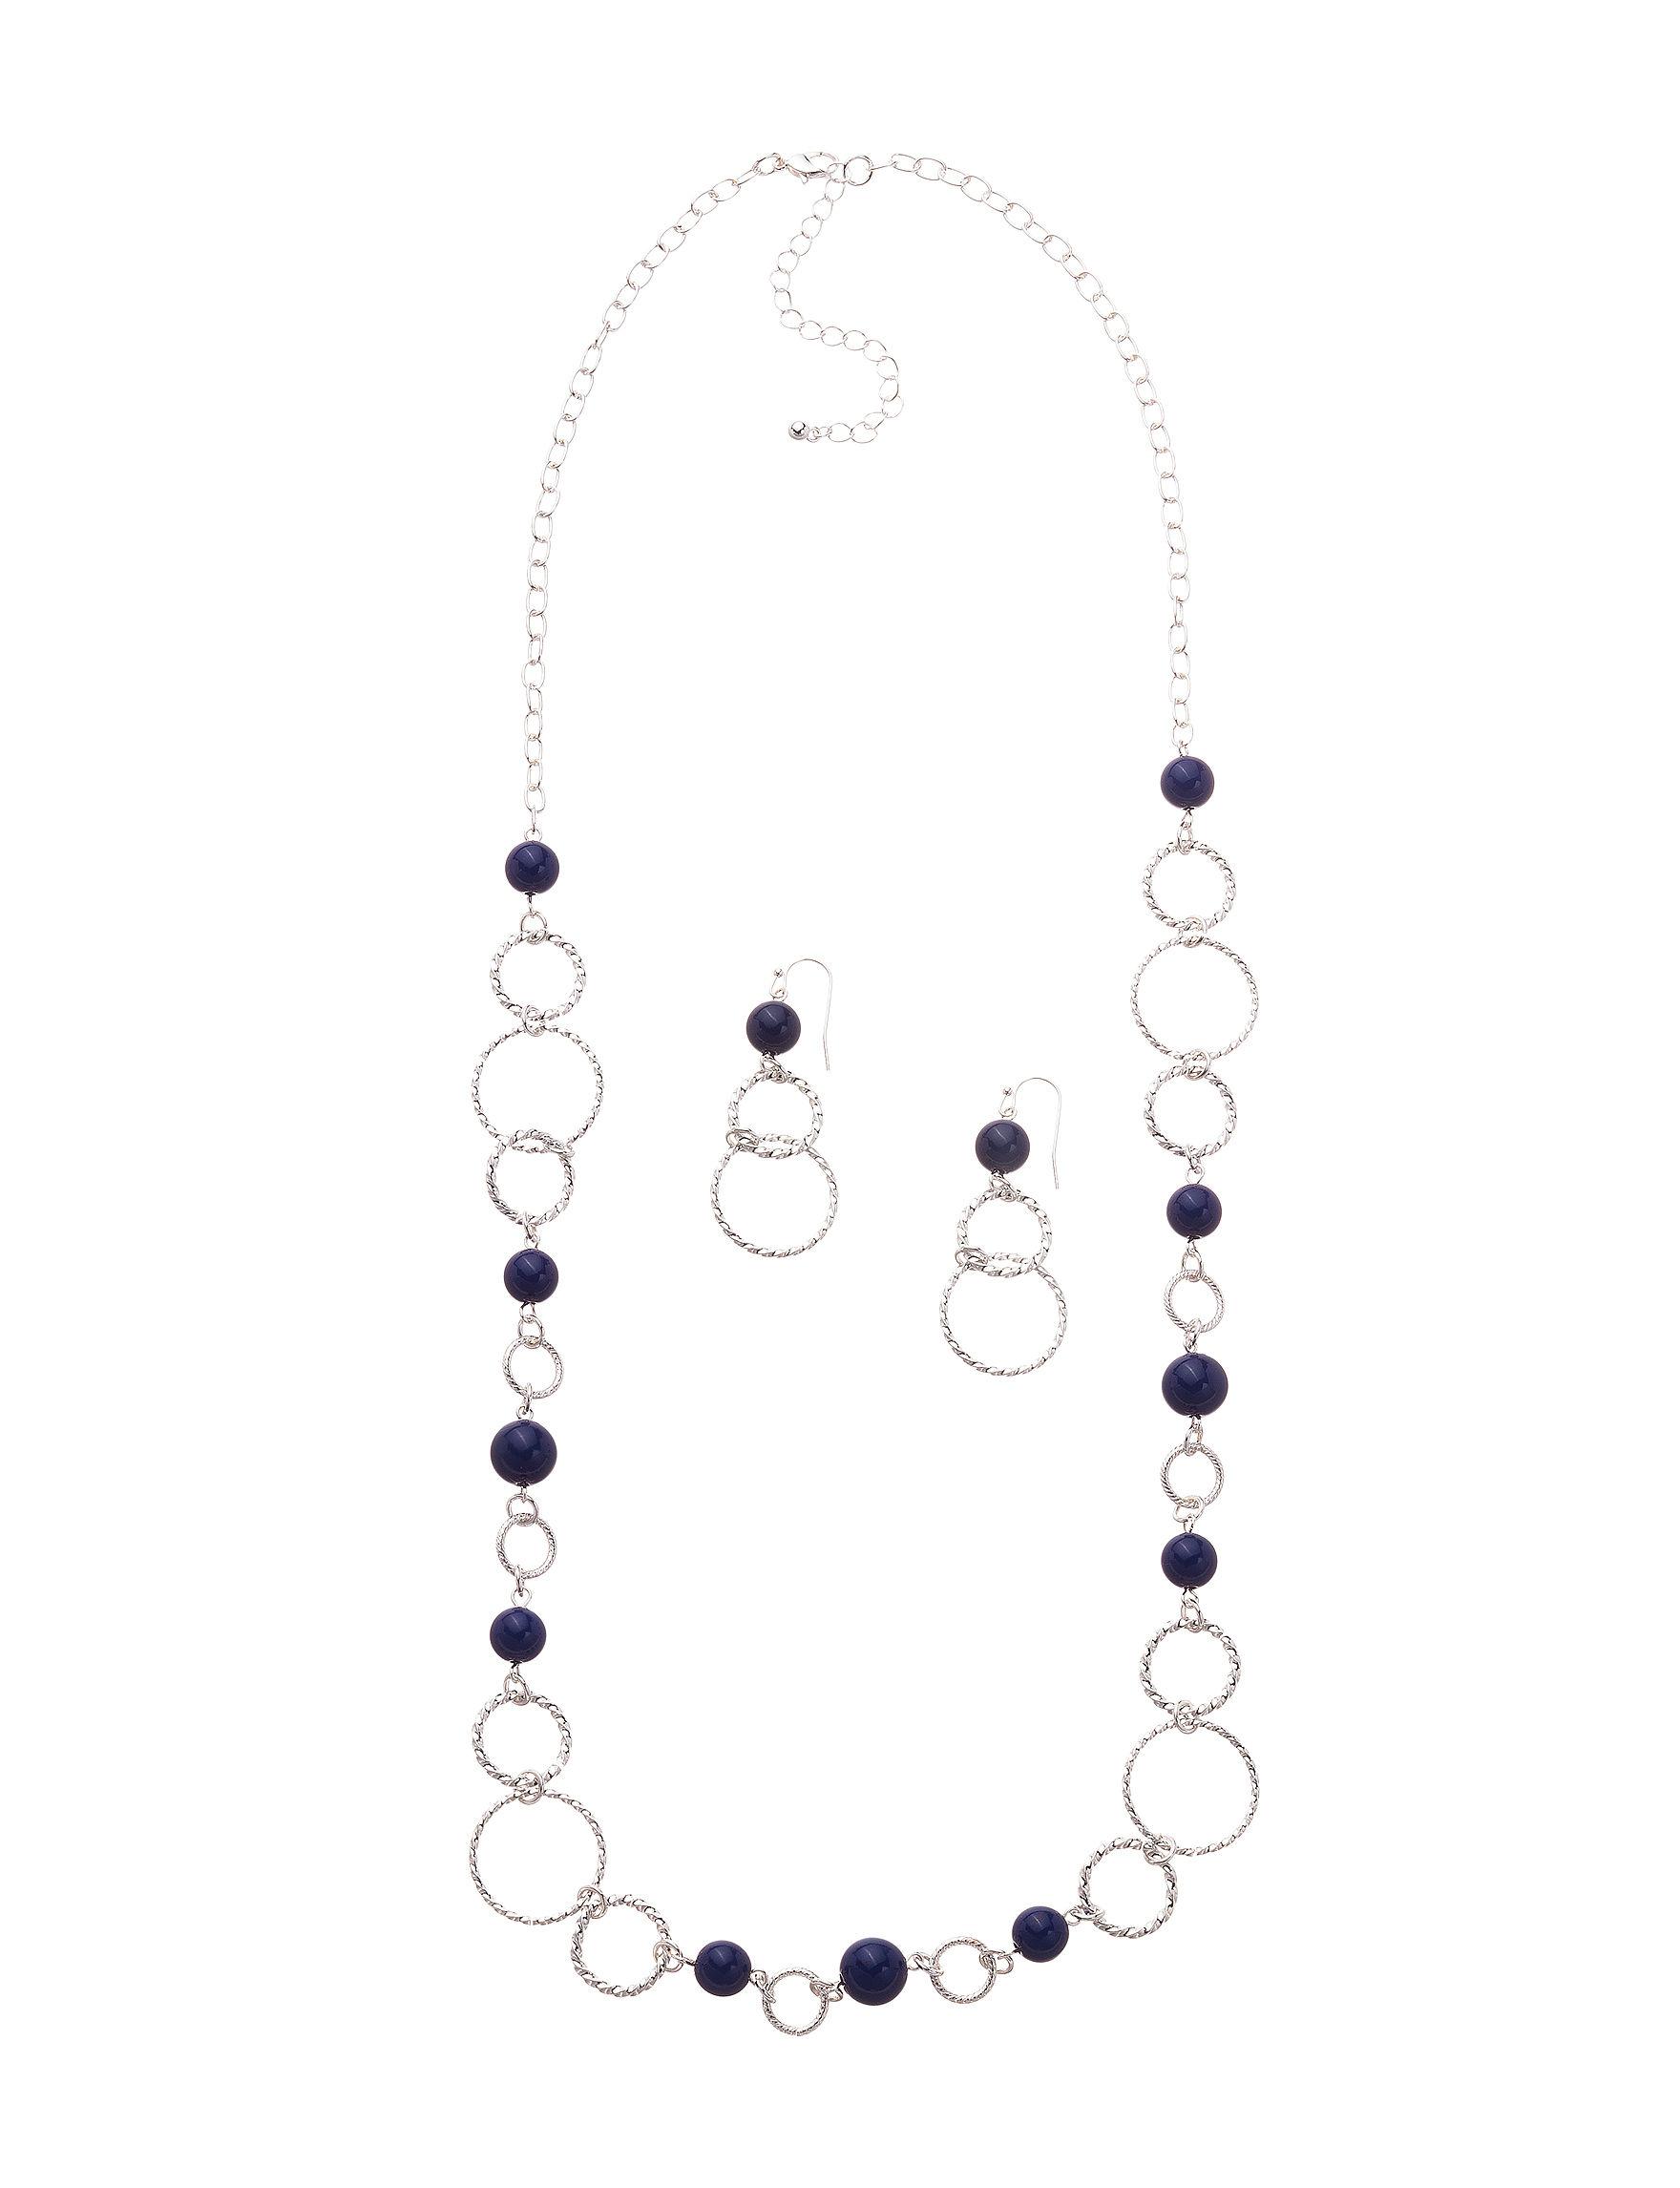 Hannah Navy Jewelry Sets Fashion Jewelry